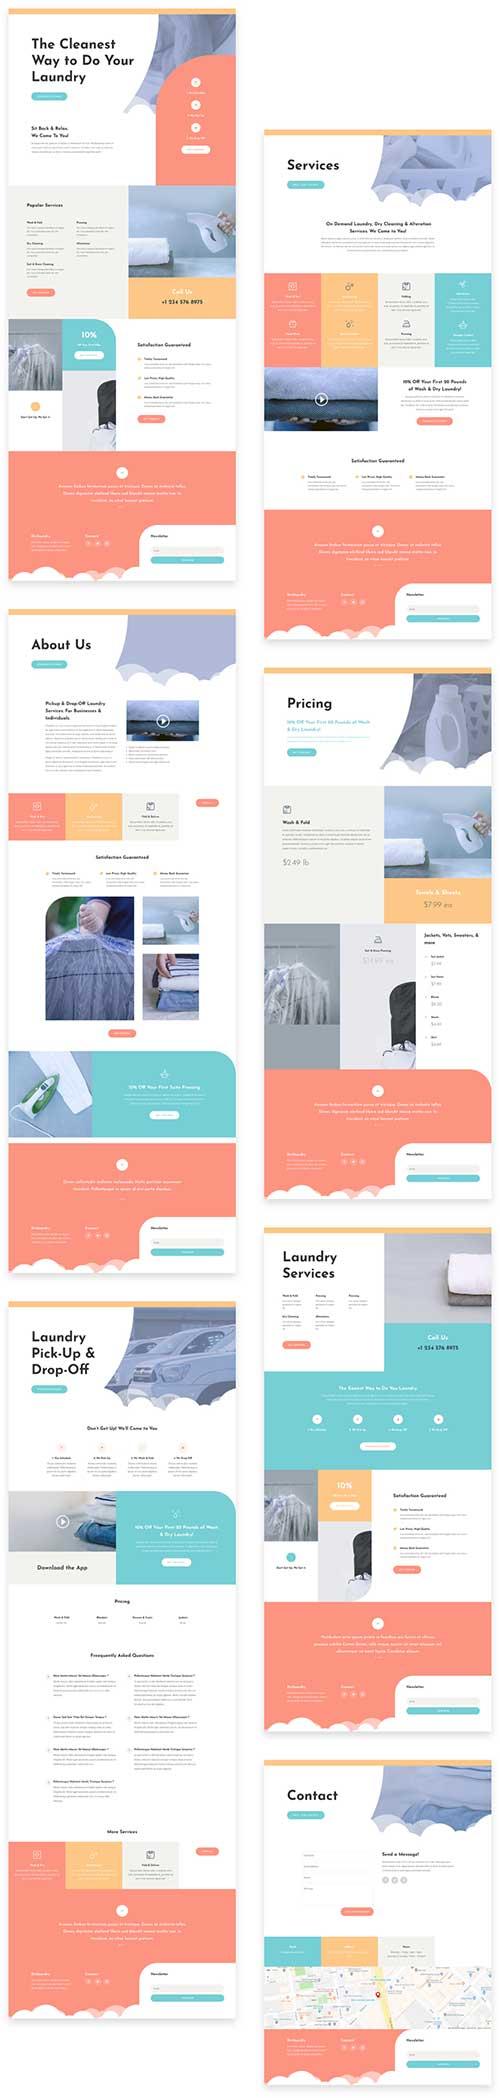 divi laundry layout pack